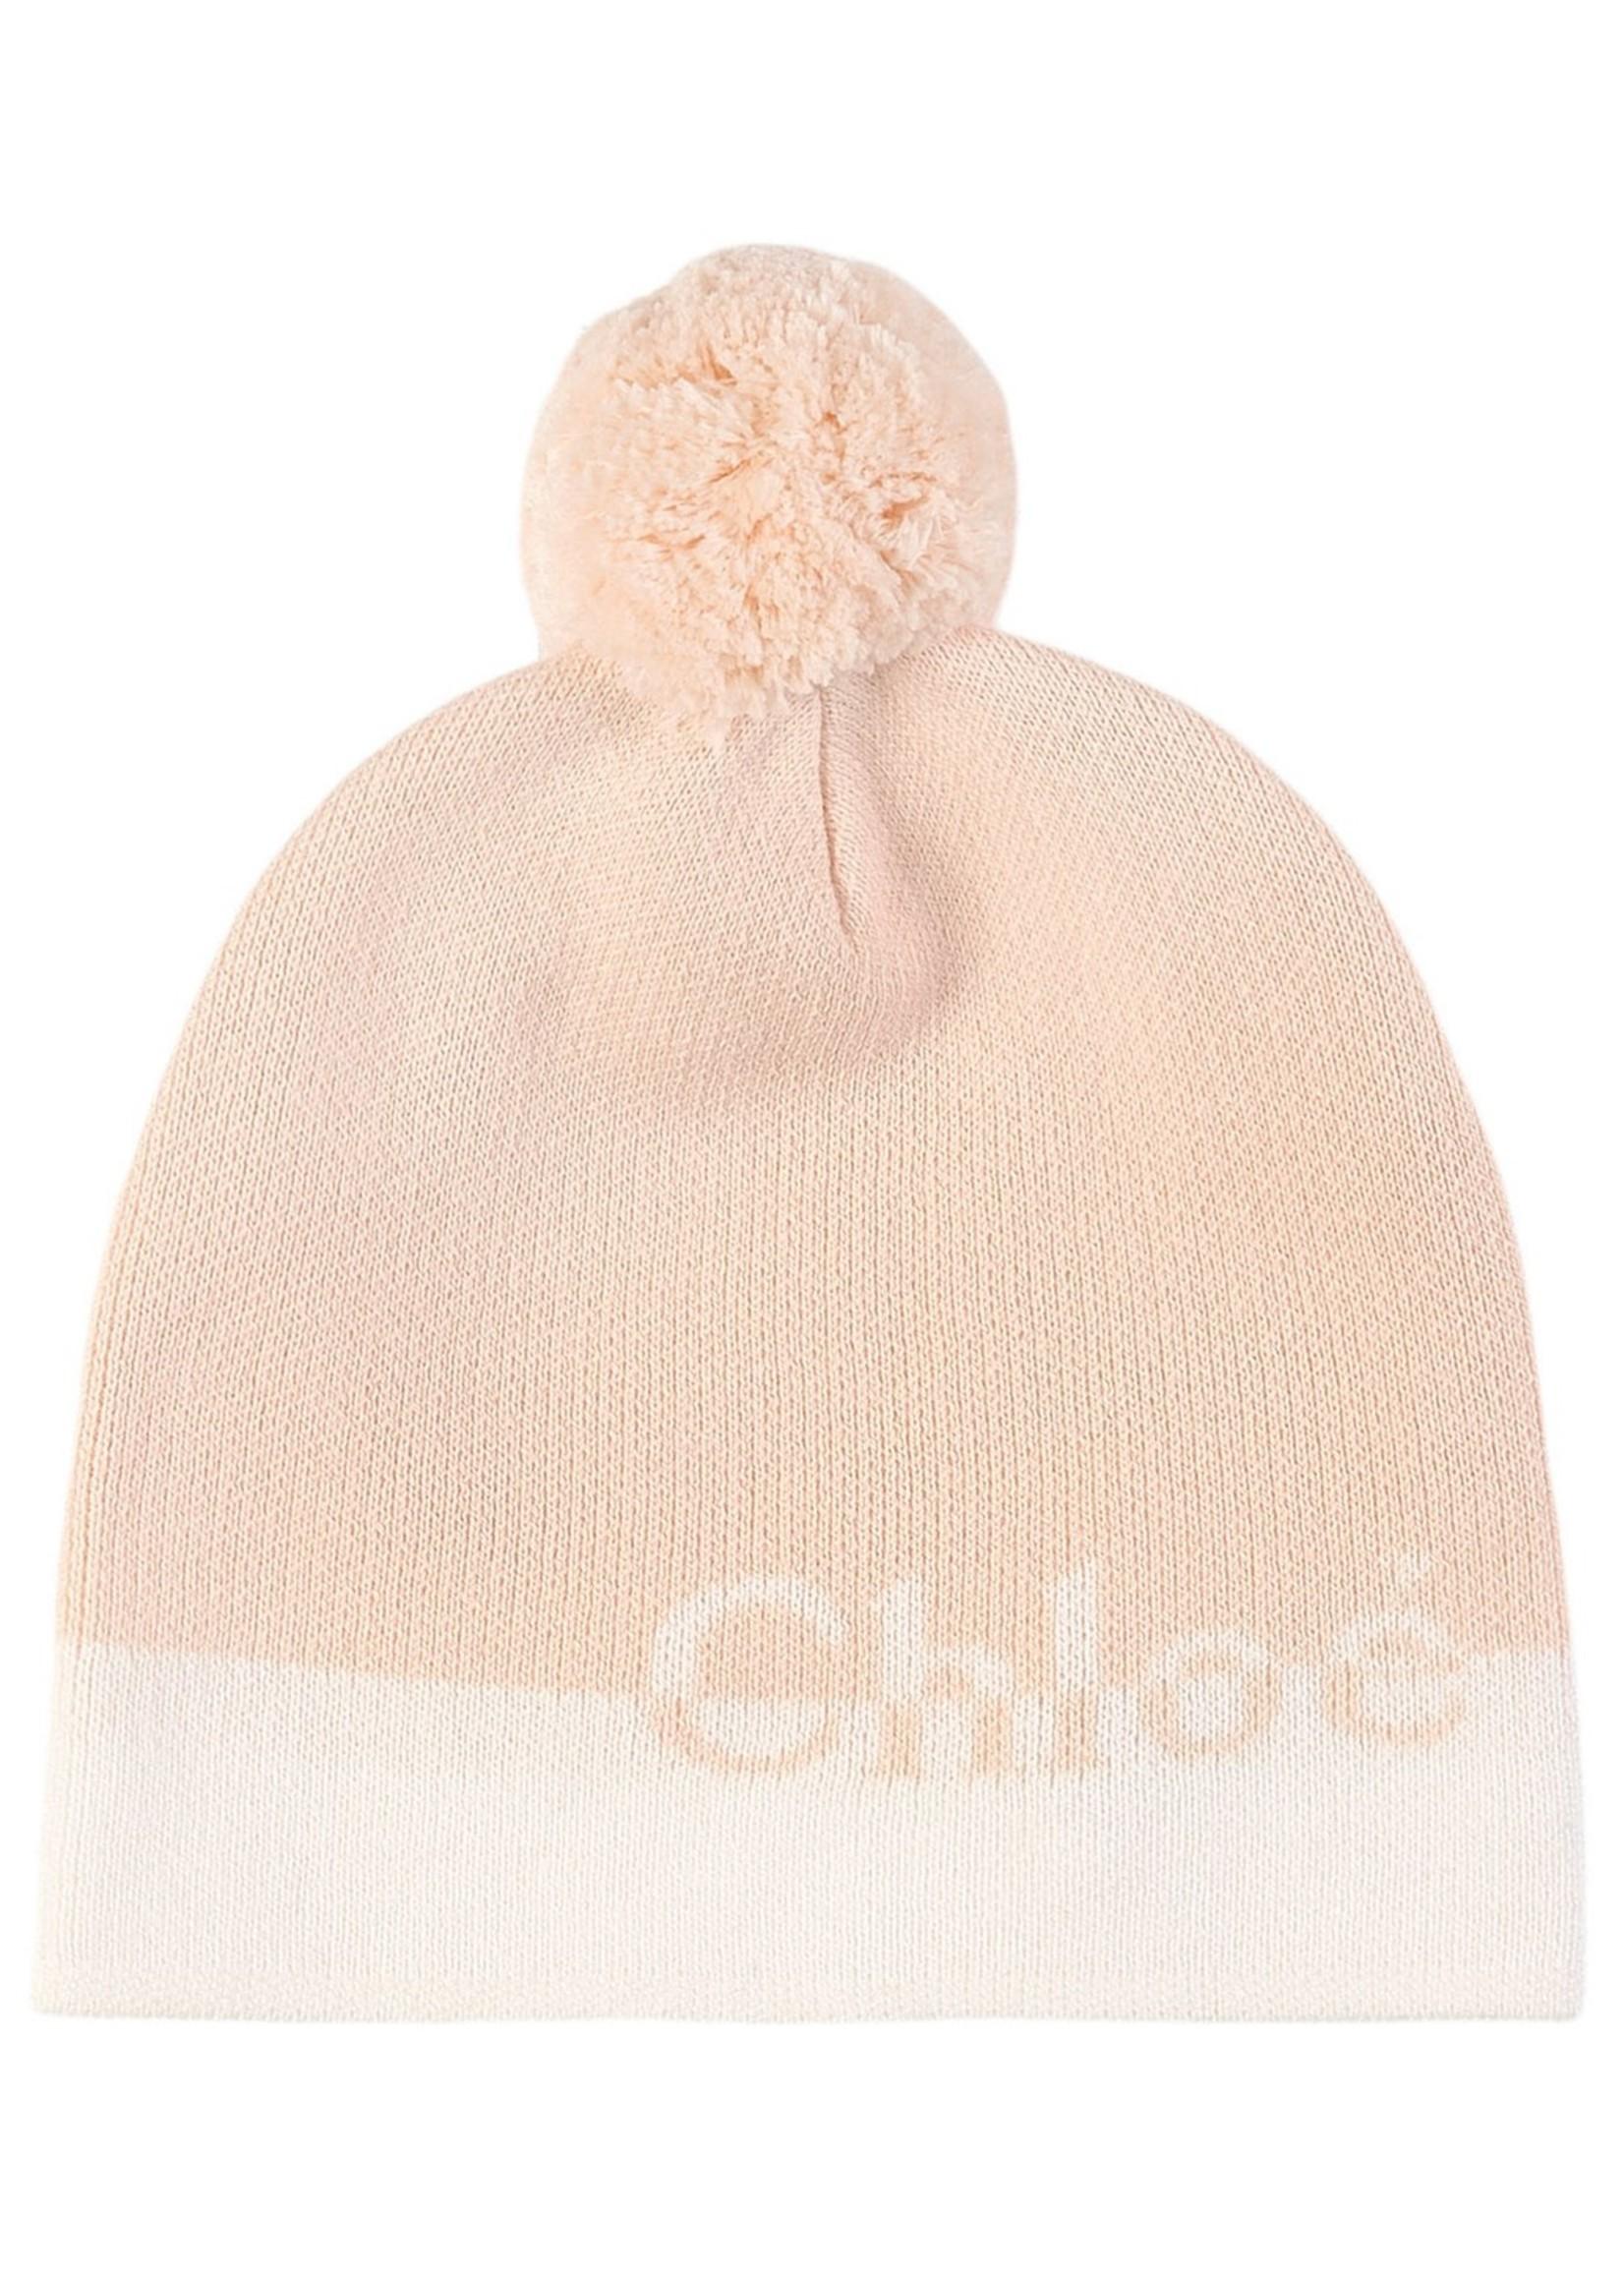 Chloe Chloe-AW21 C11195 BONNET